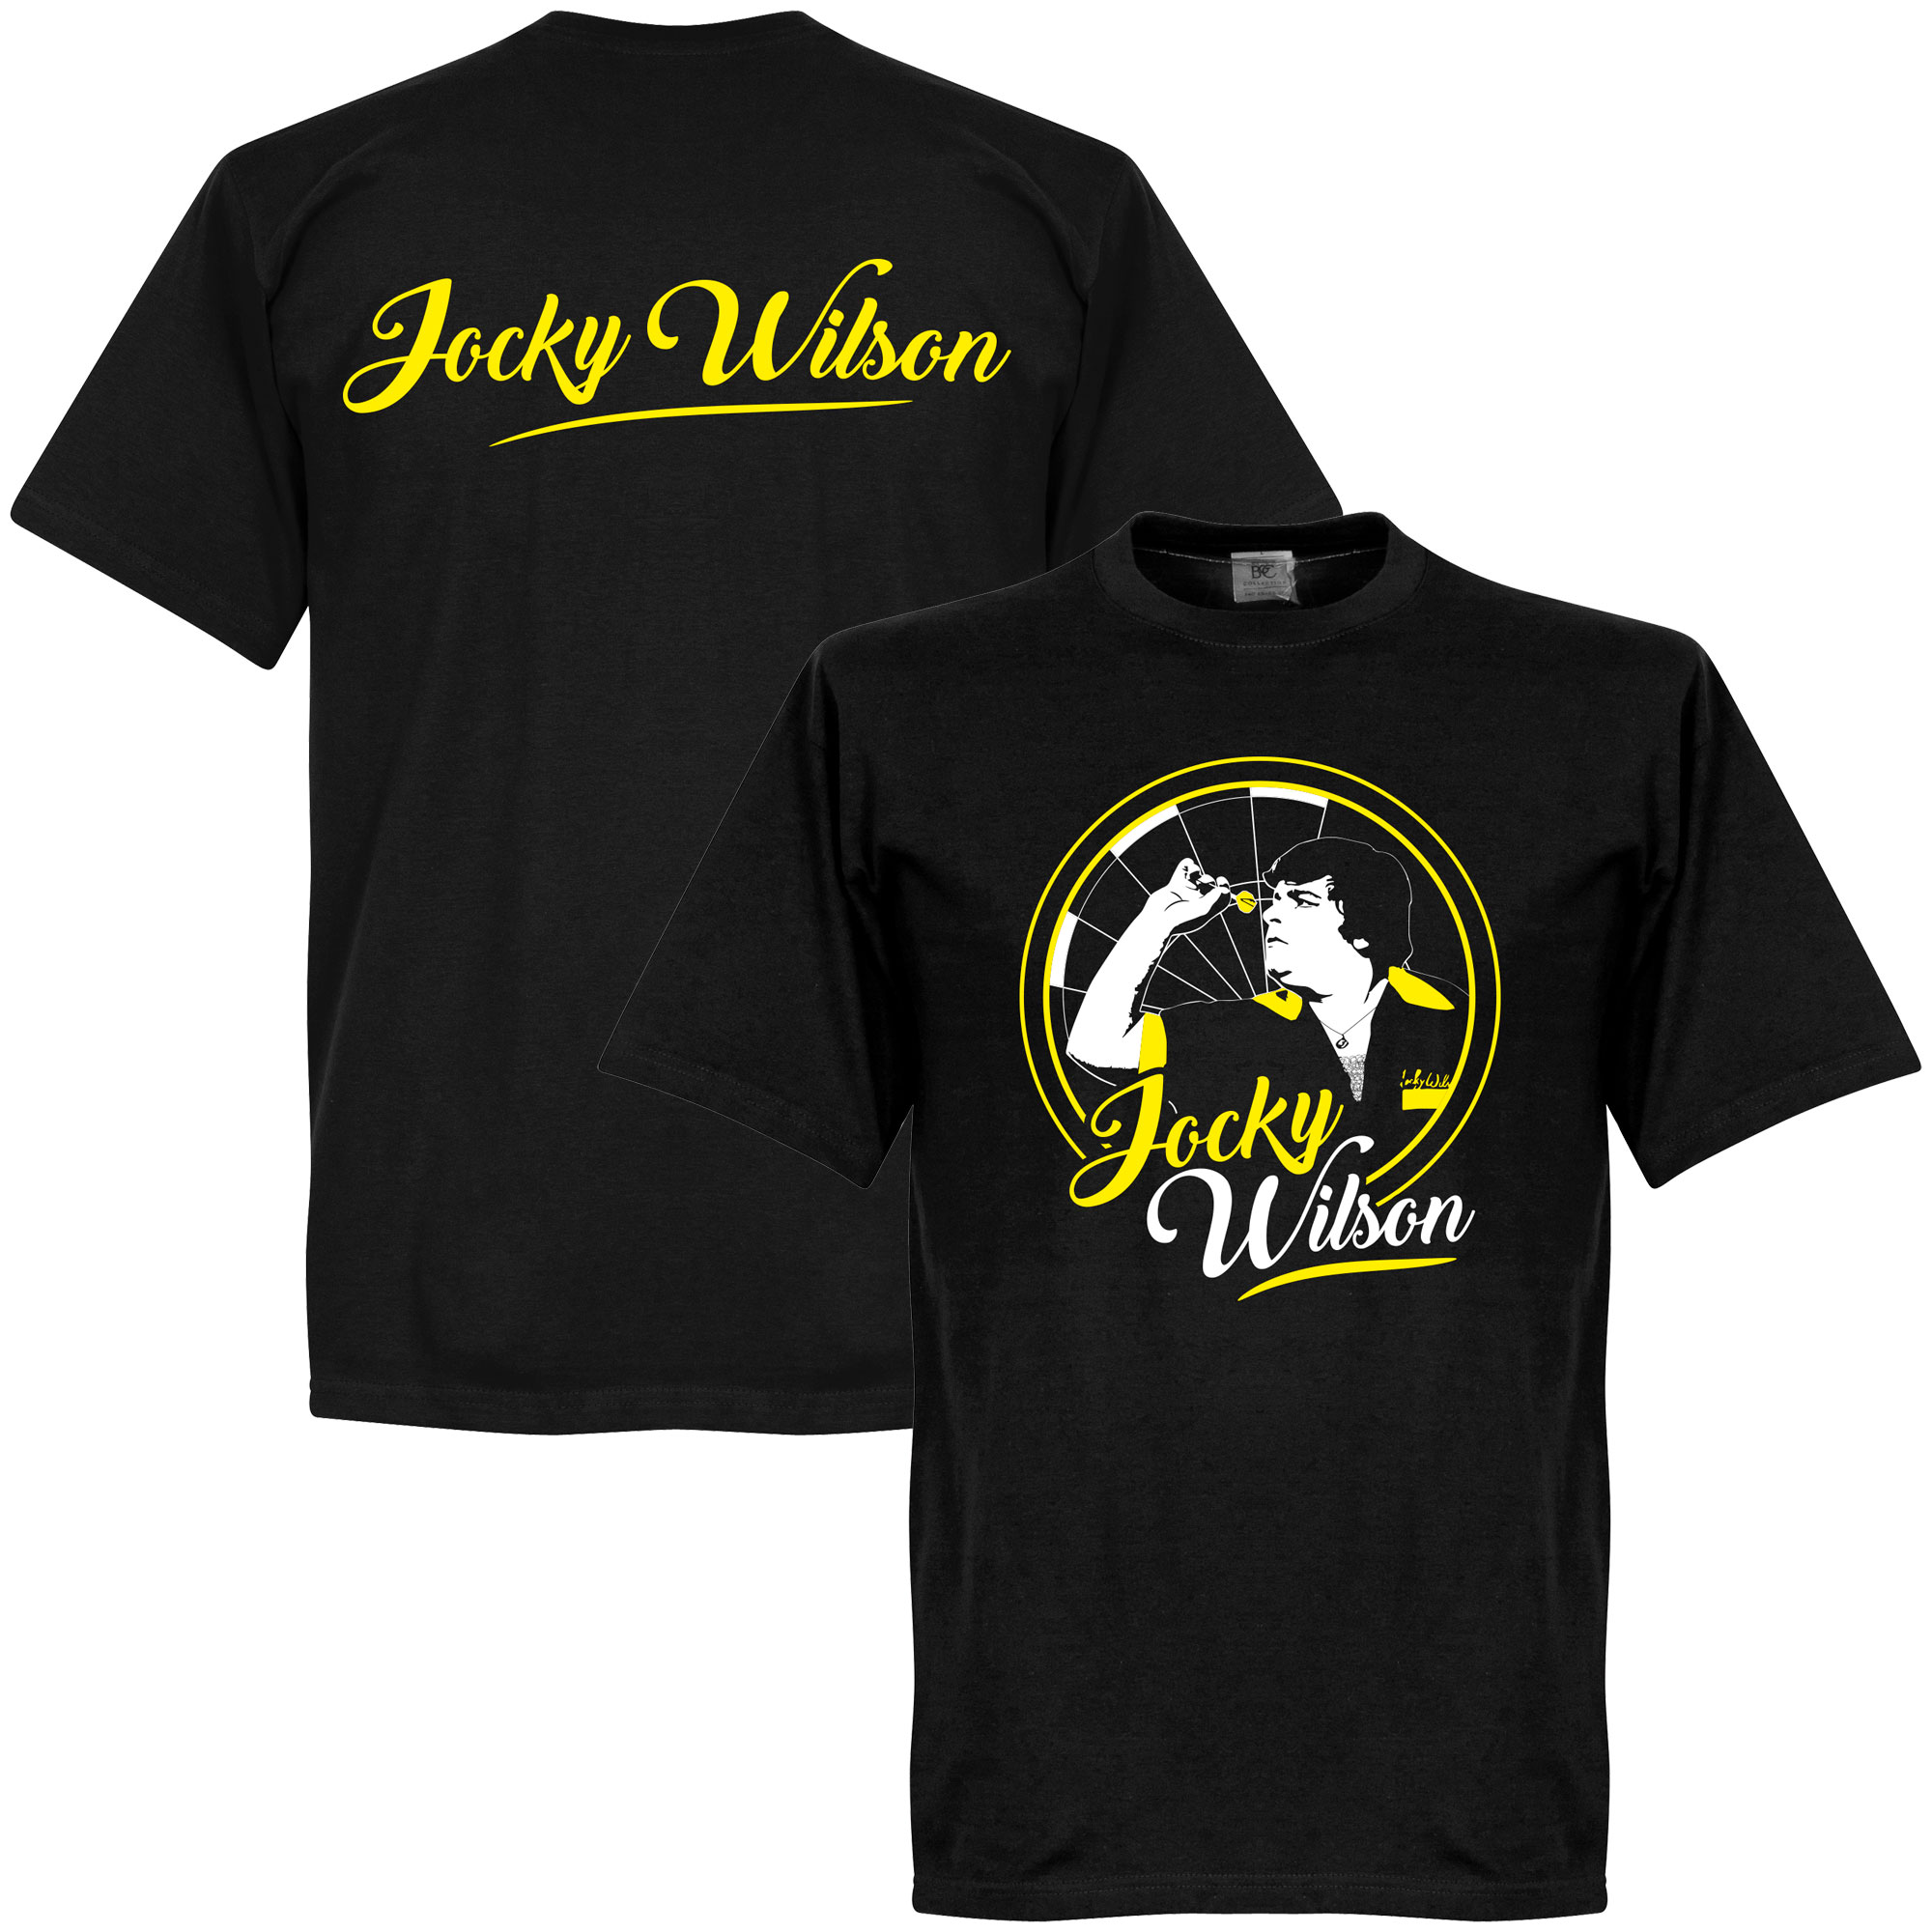 Jocky Wilson Darts T-Shirt - Zwart - S